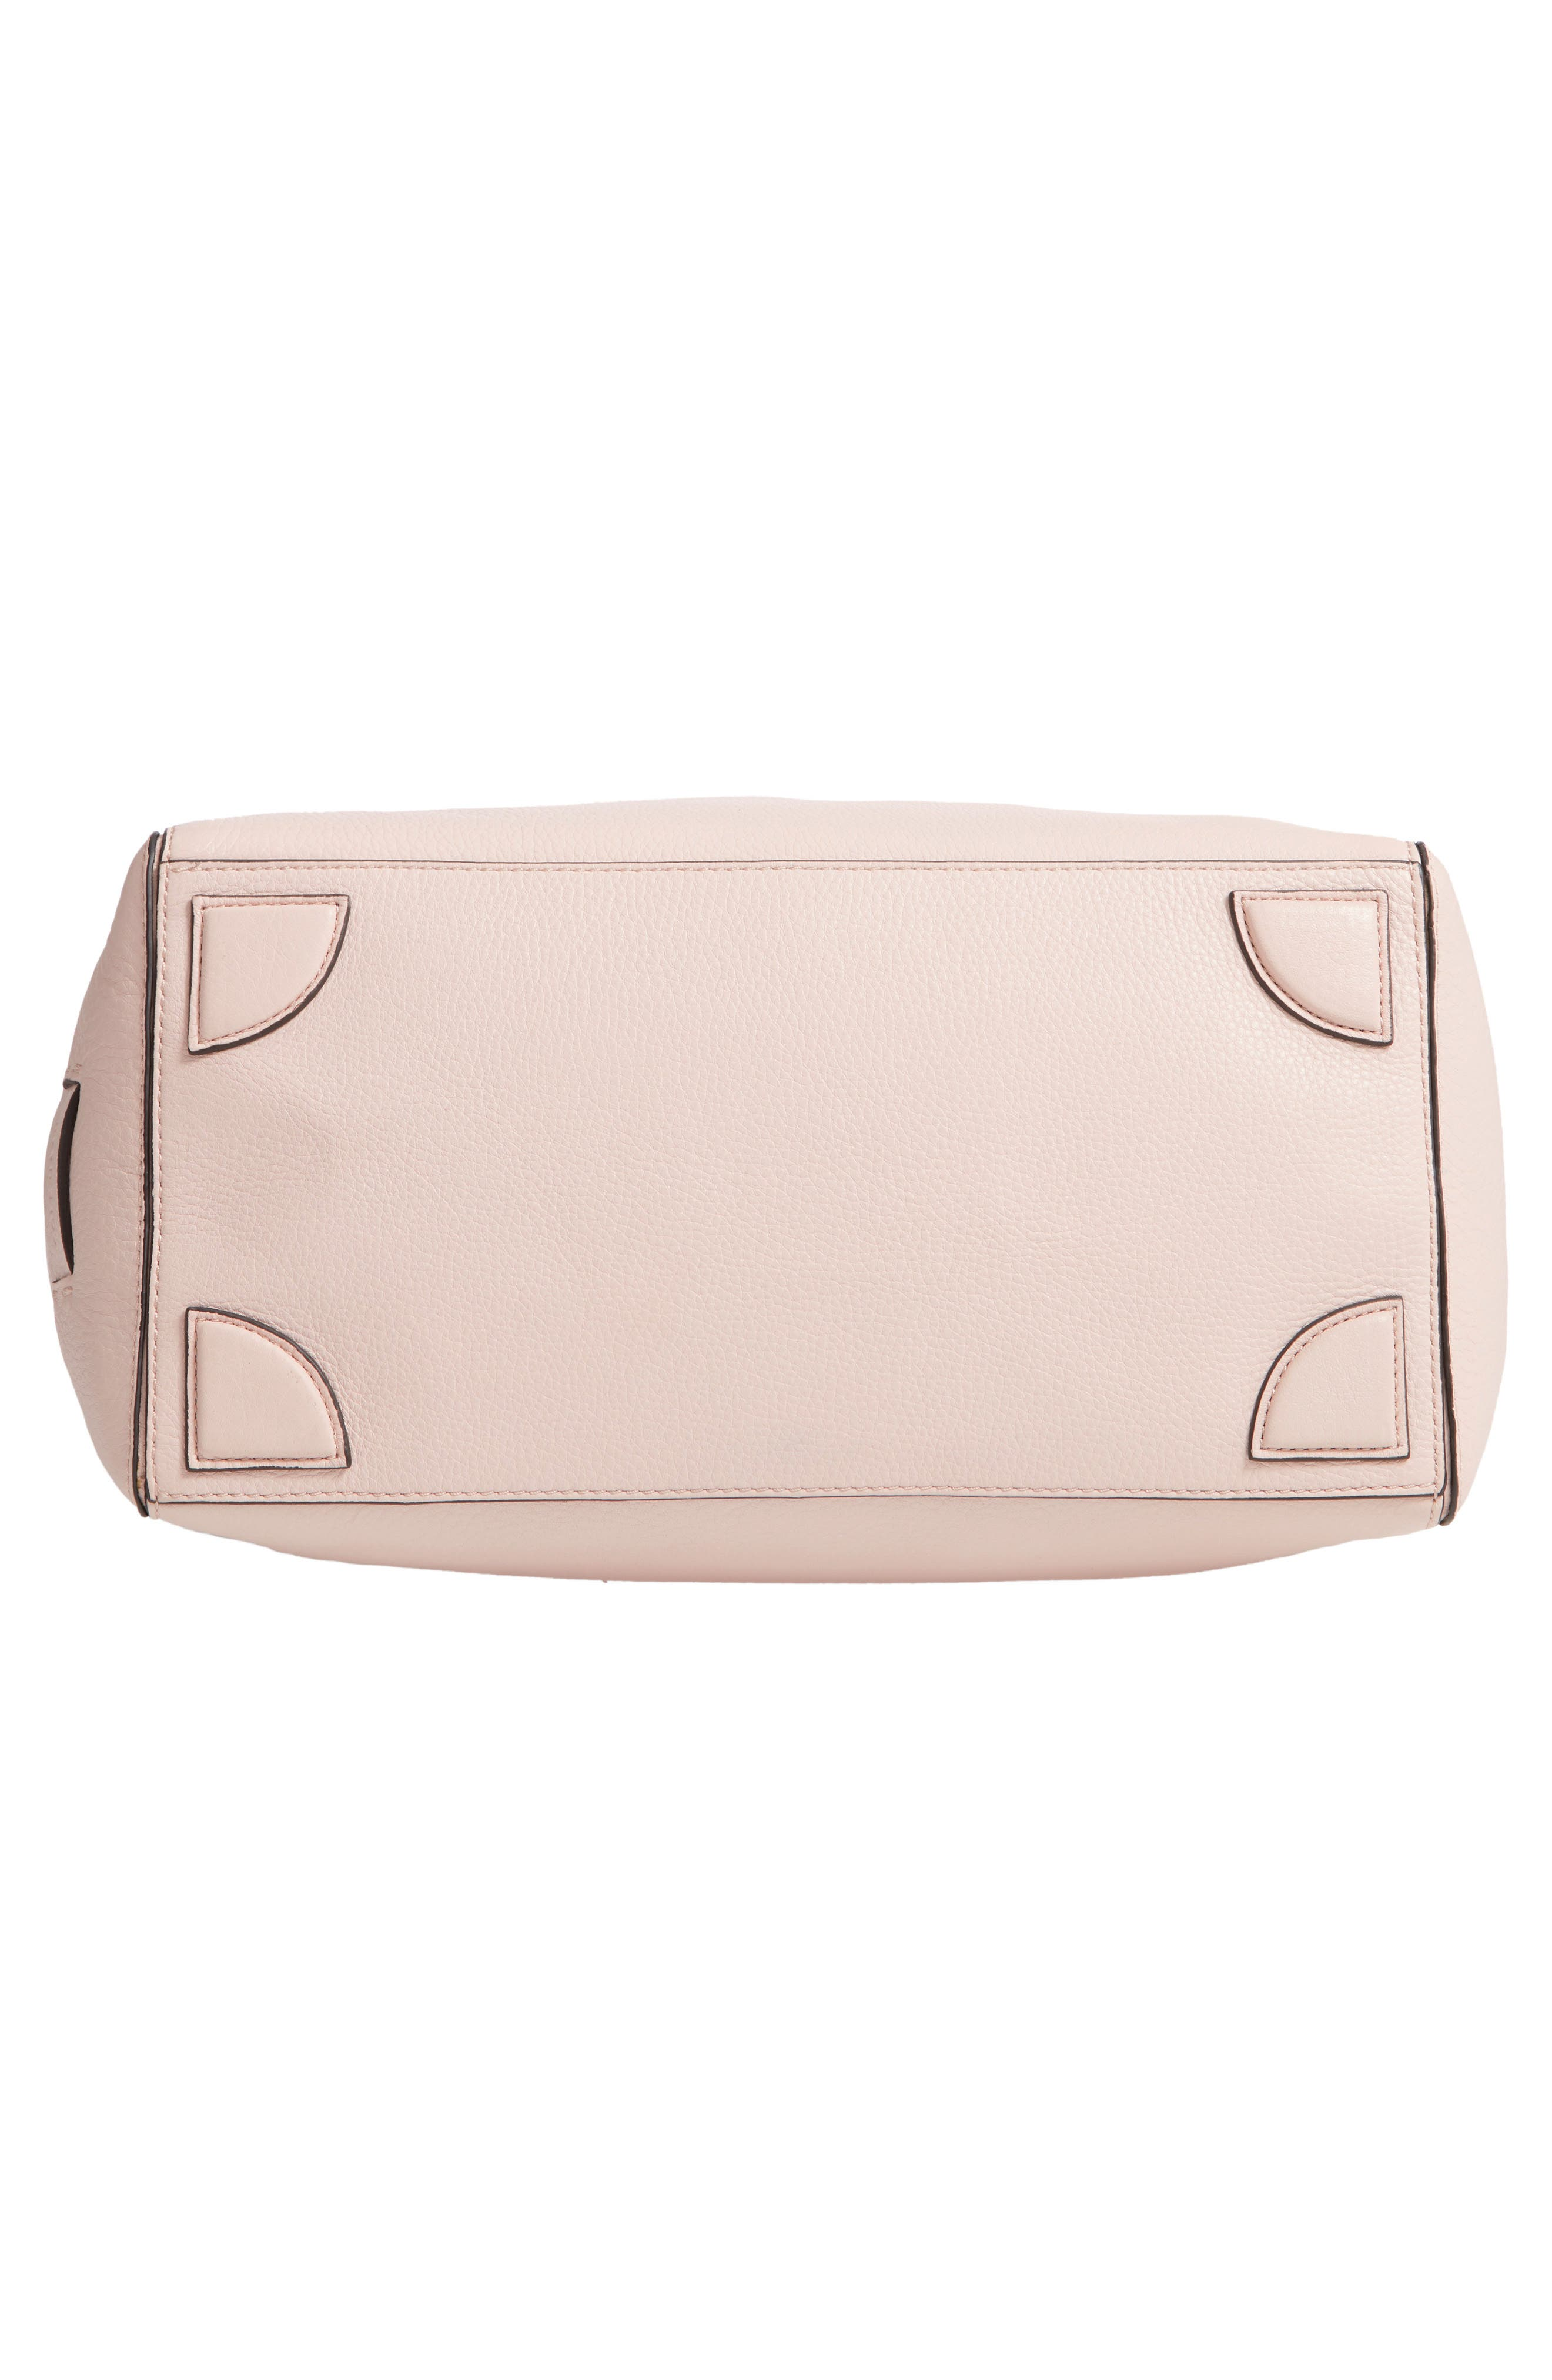 Cassidy RFID Pebbled Leather Bucket Bag,                             Alternate thumbnail 24, color,